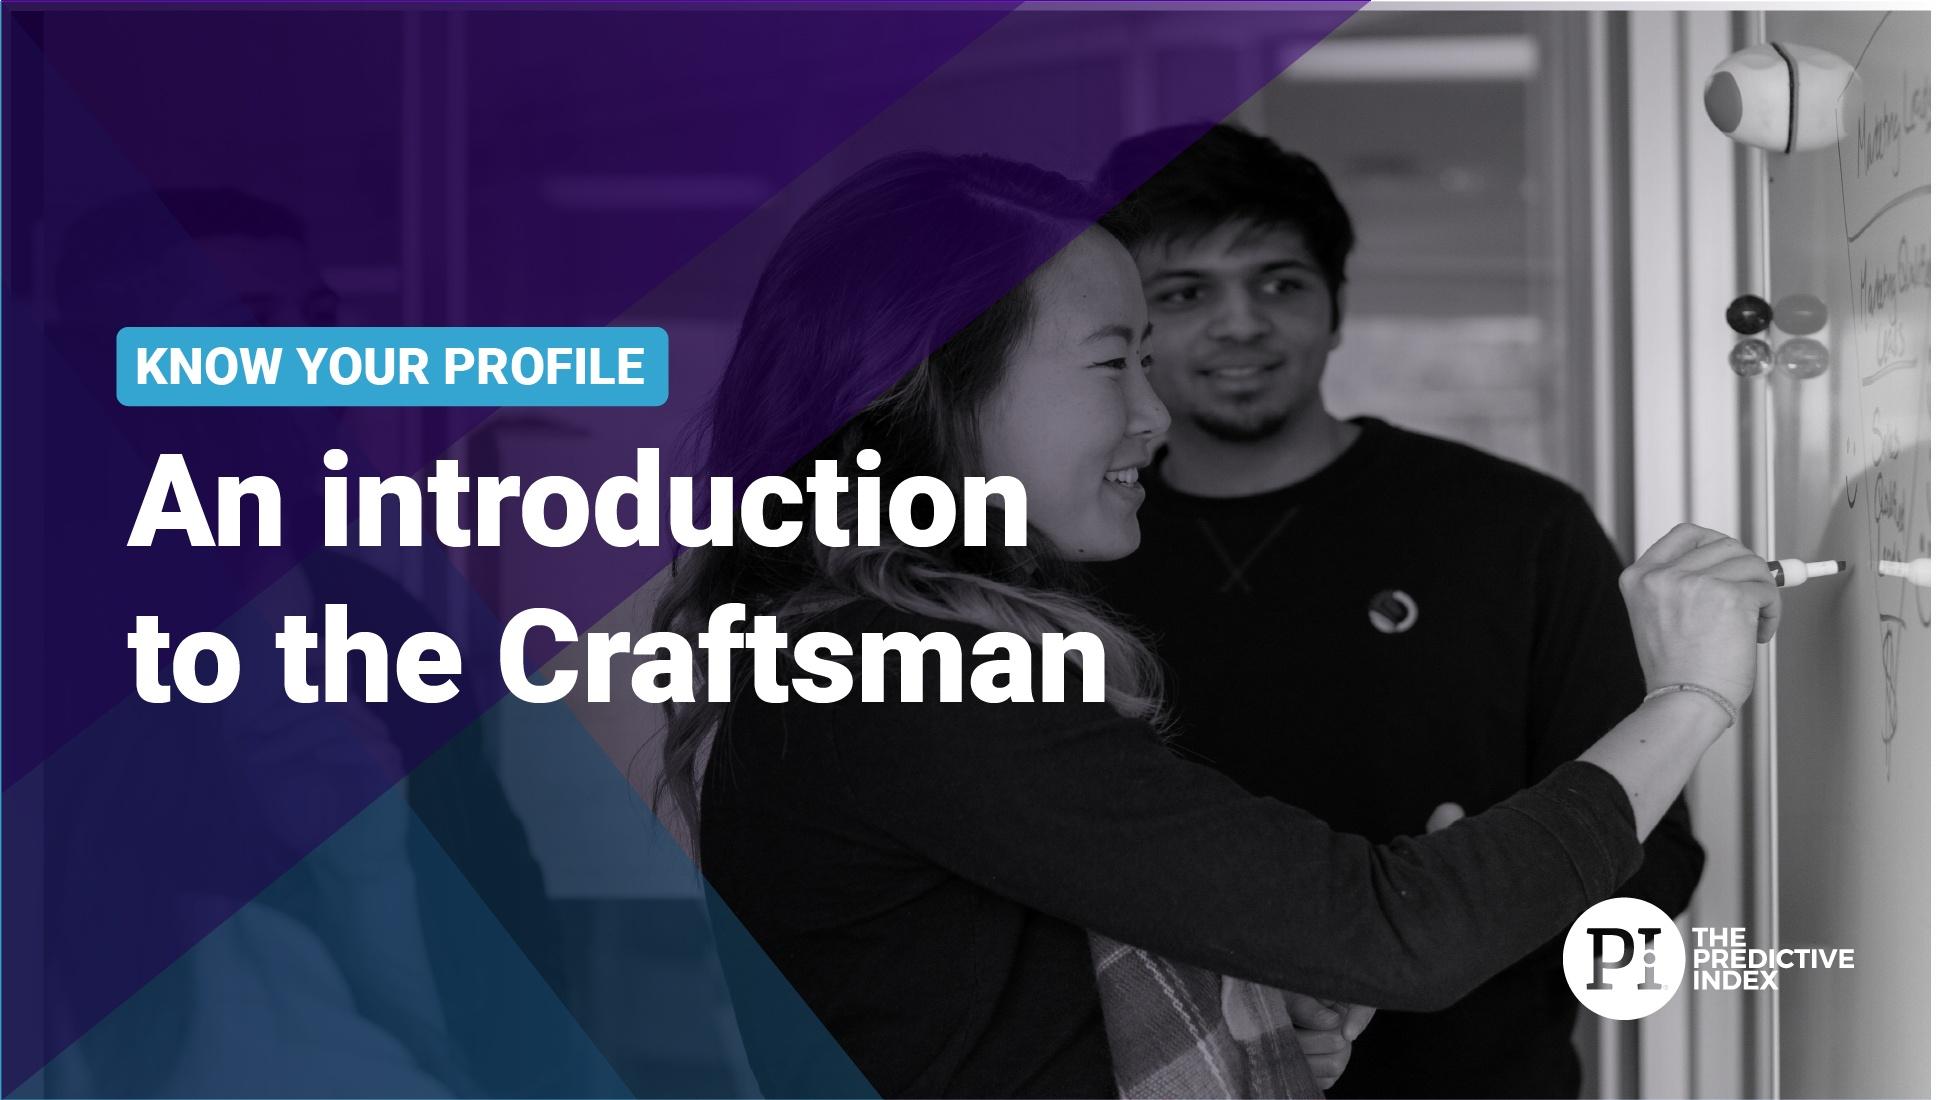 Introducing the Craftsman